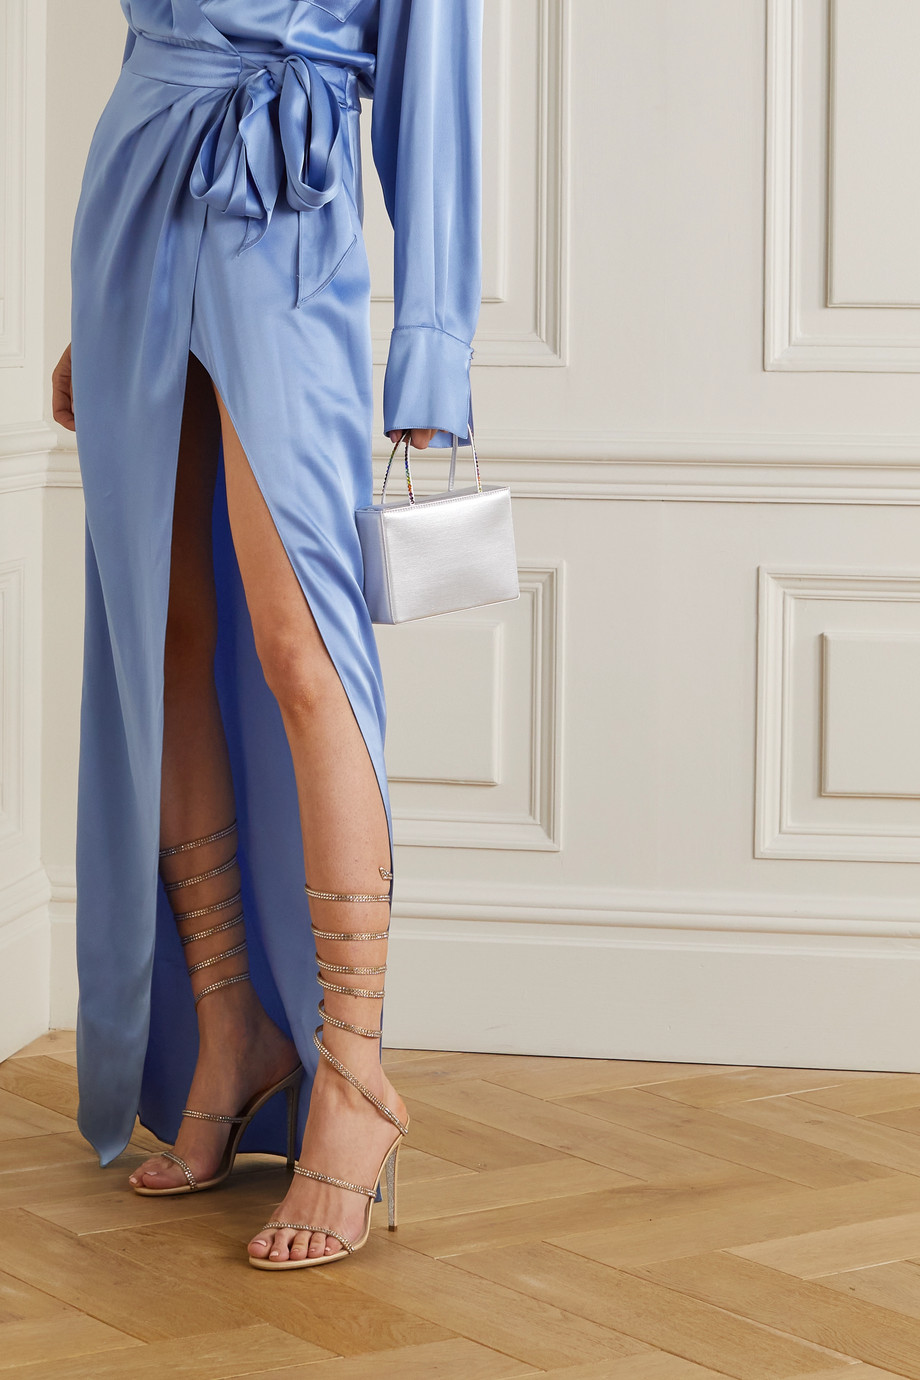 René Caovilla Cleo crystal-embellished leather sandals